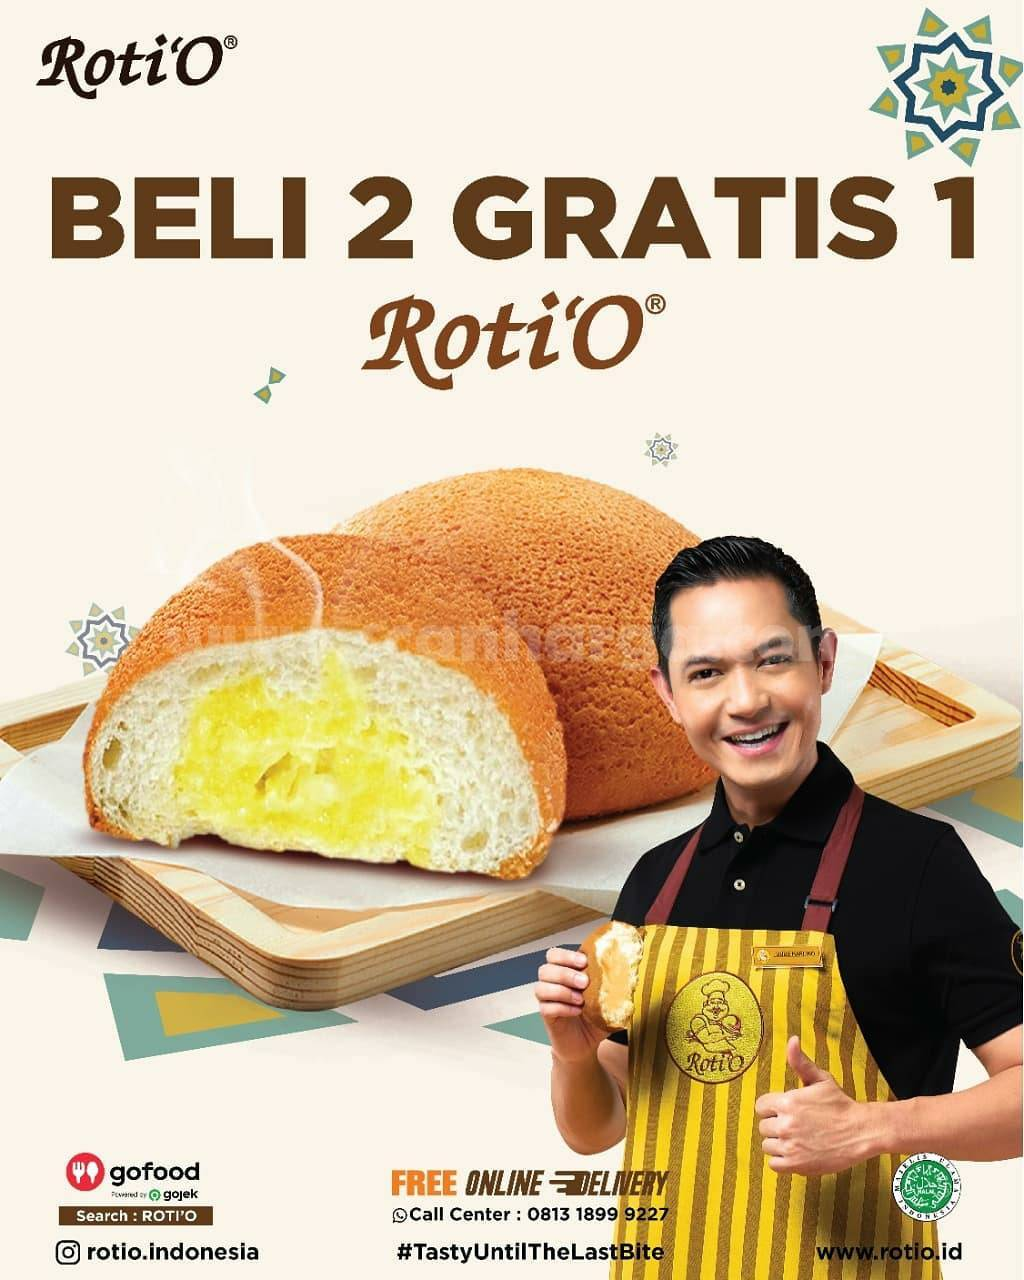 Promo ROTI'O Beli 2 Gratis 1 - Beli Pastry cuma Rp 12.000 & Kopi O cuma 25K